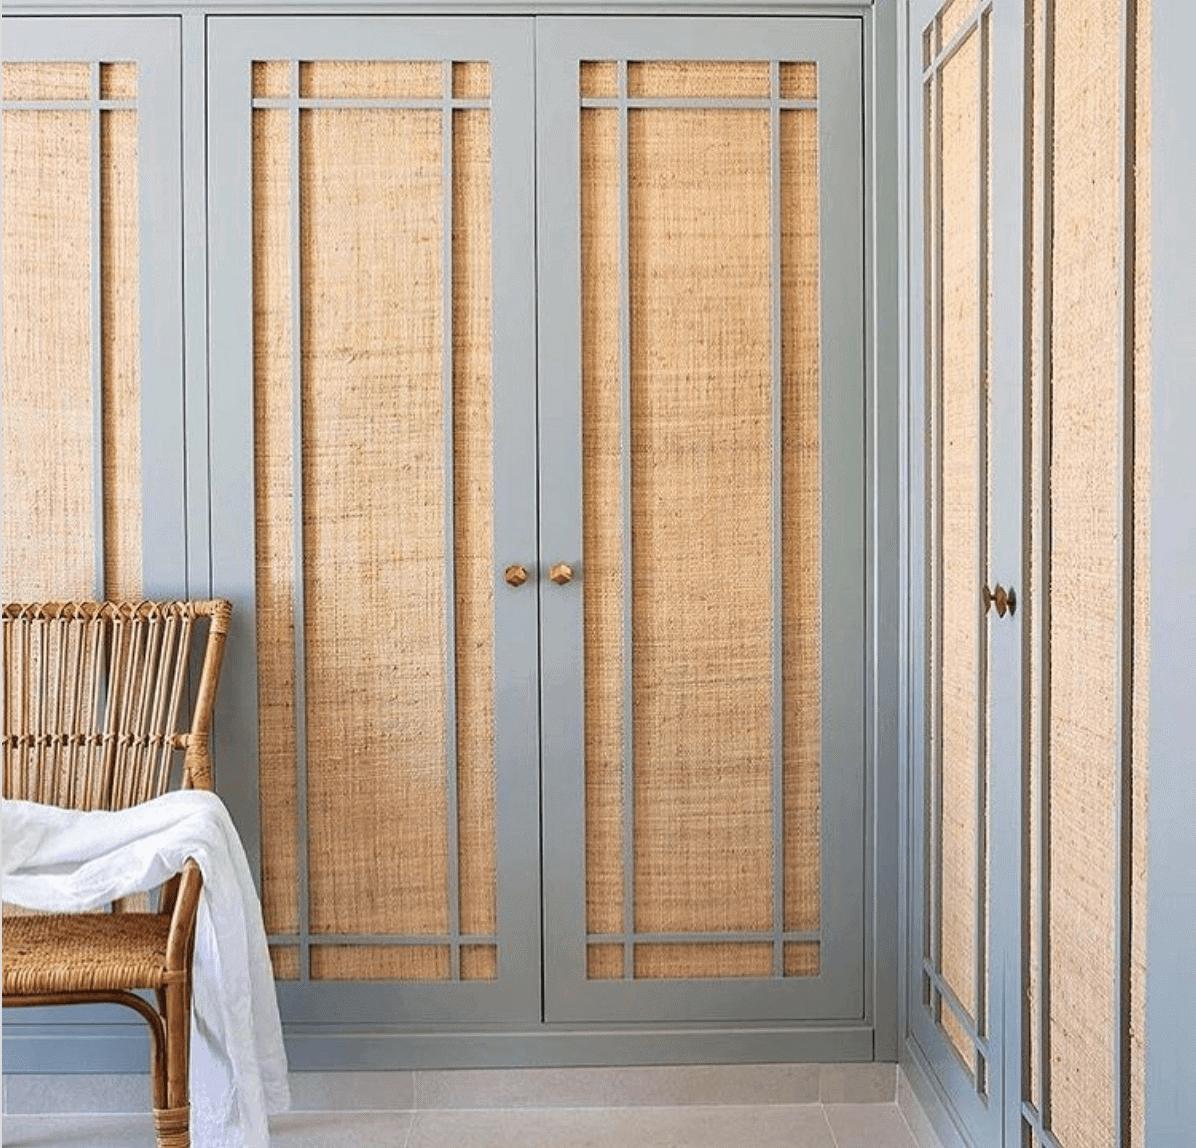 cane-built-in-wardrobe